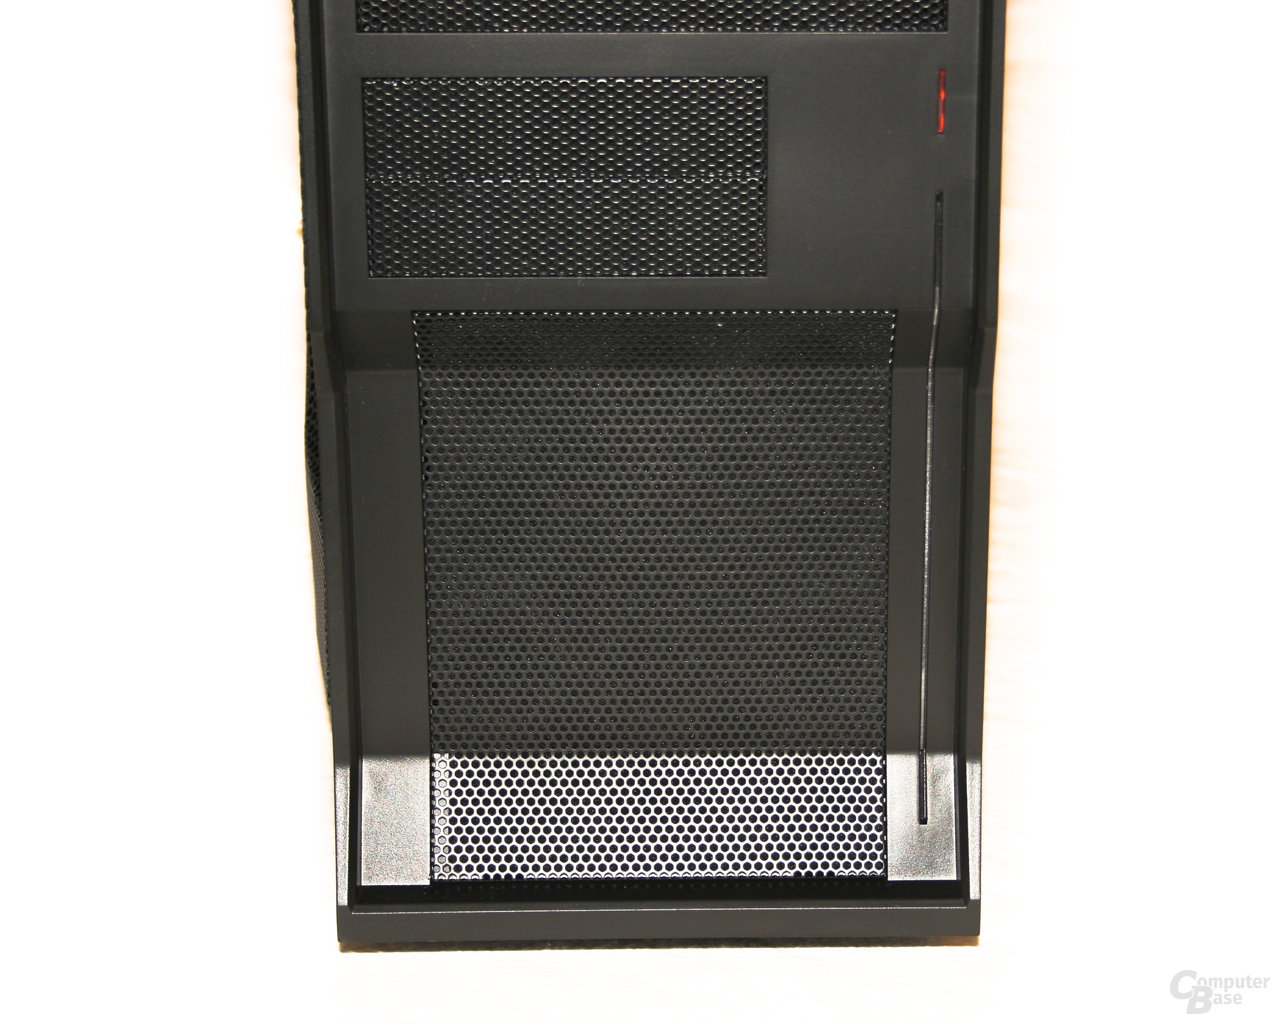 NZXT Vulcan – Status- und HDD-LED